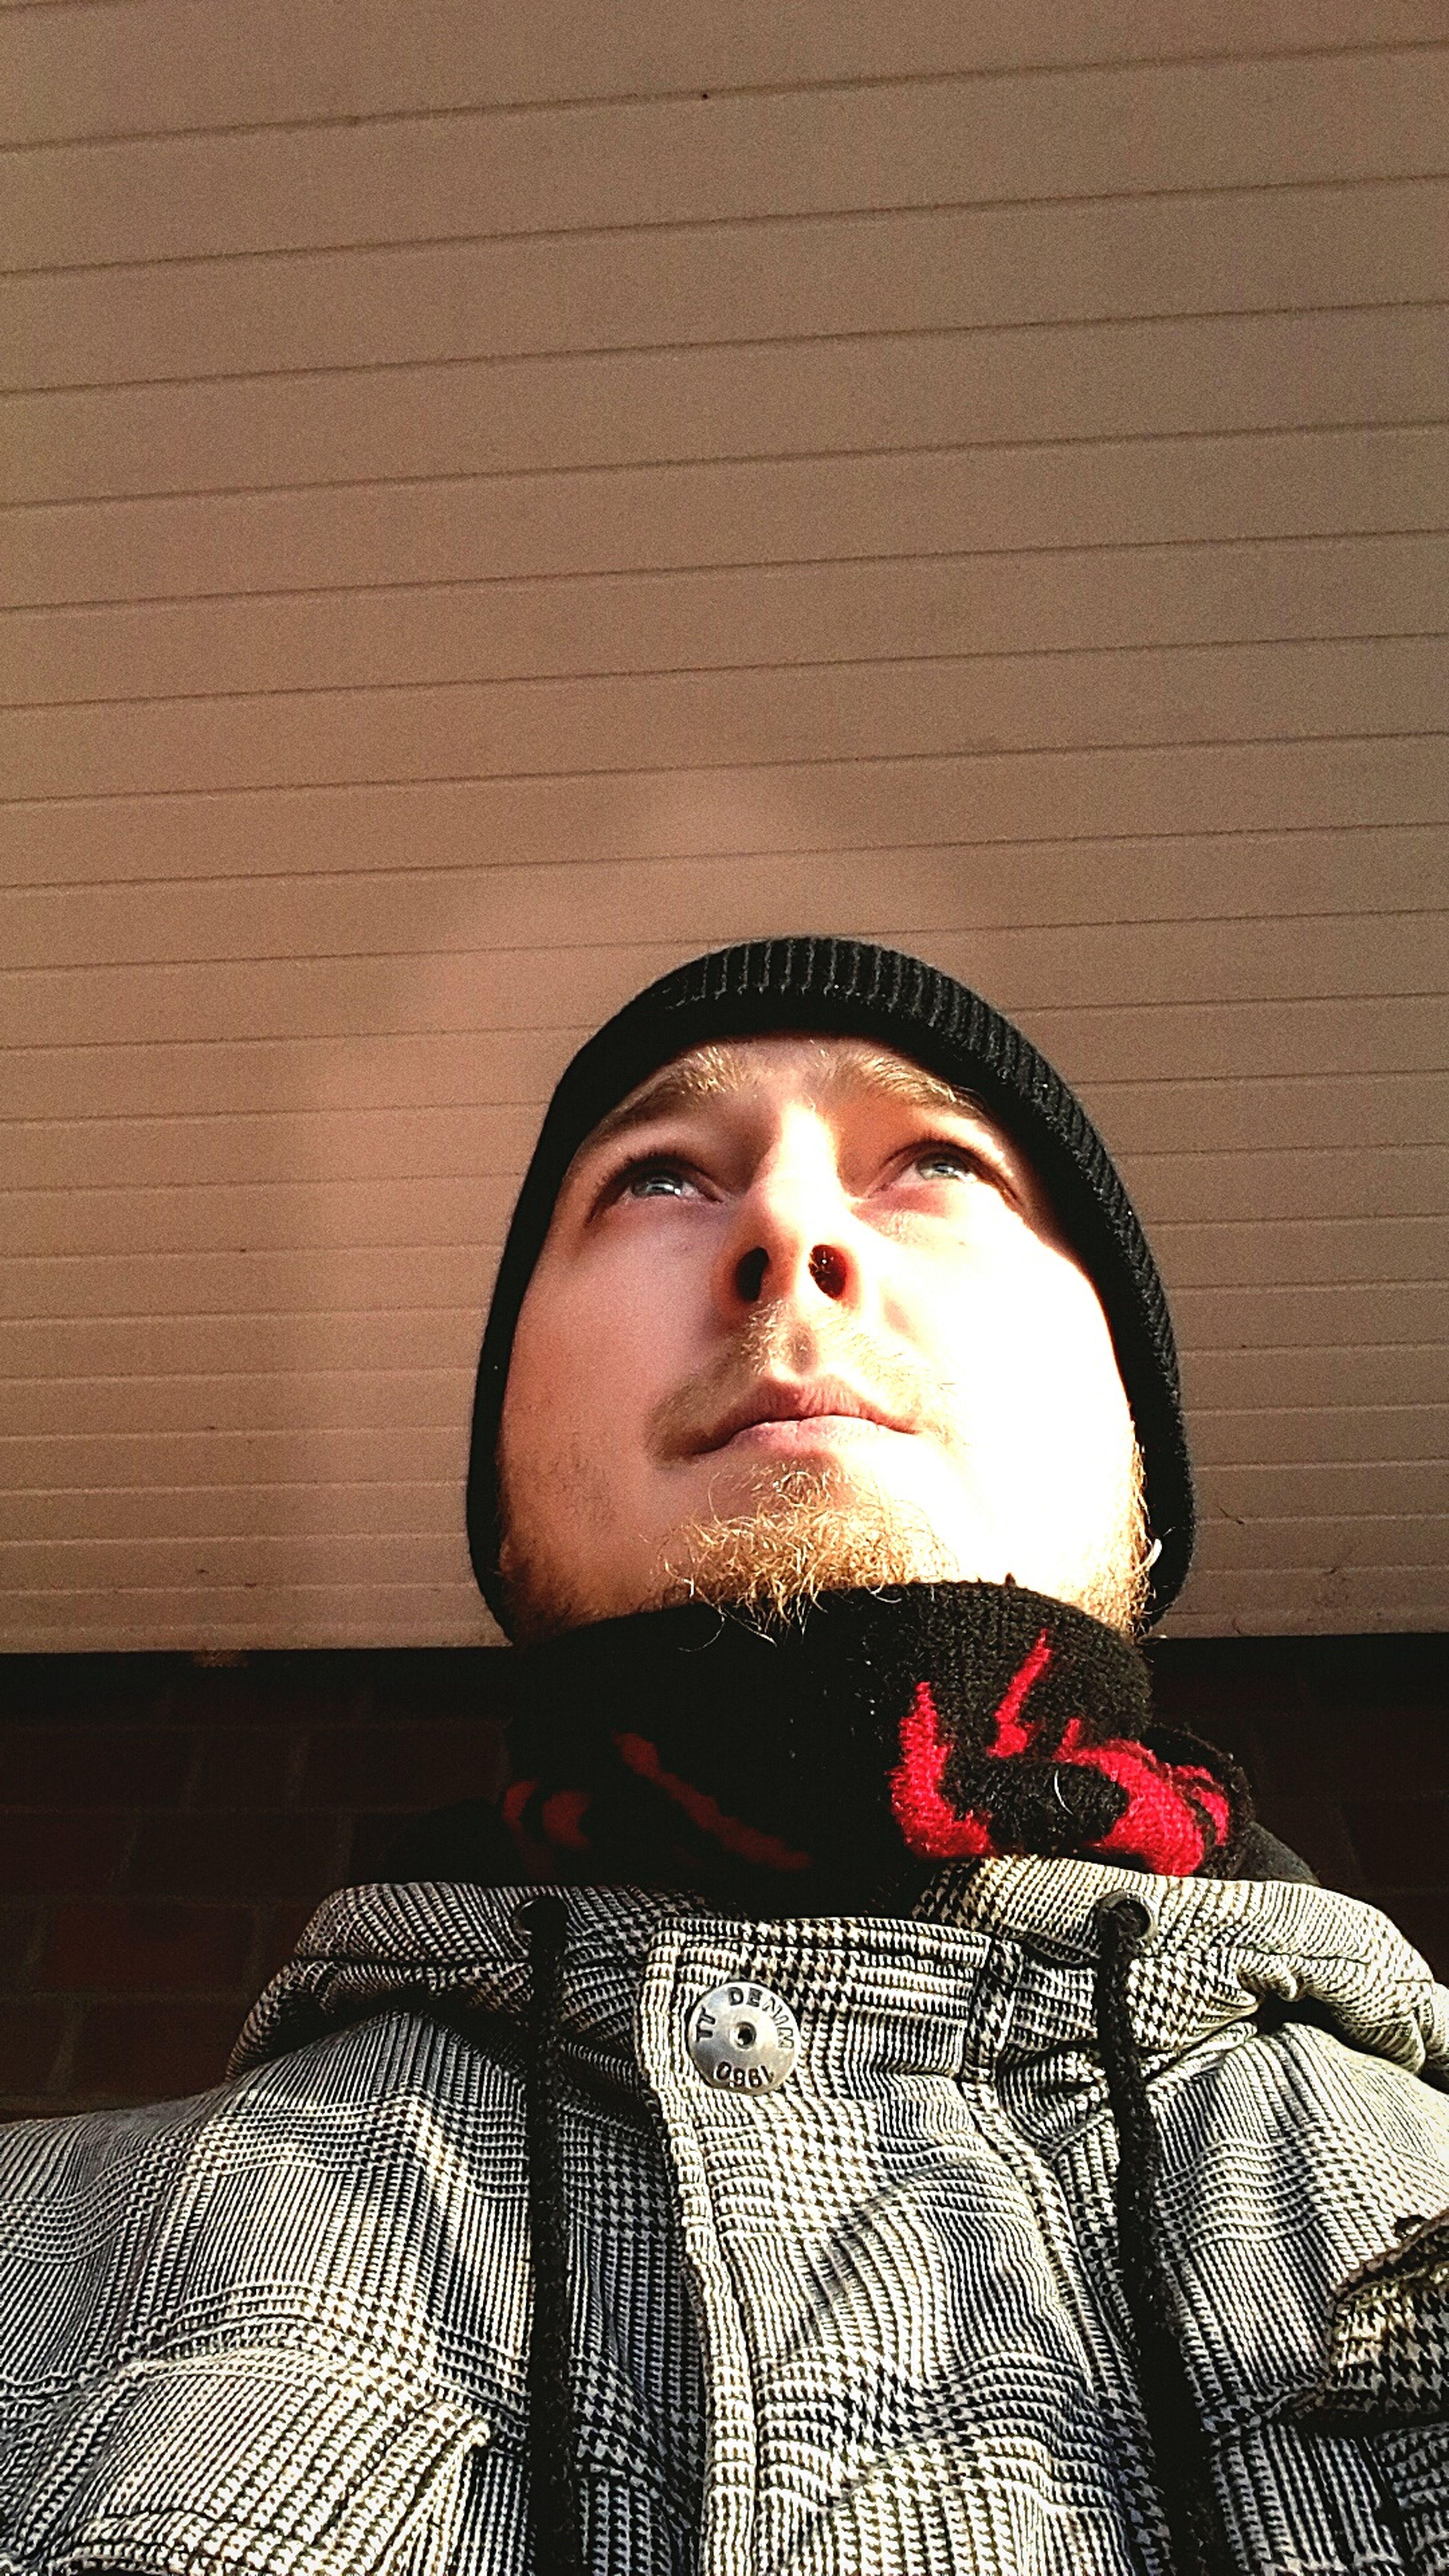 Sun is shining @ Wintertime